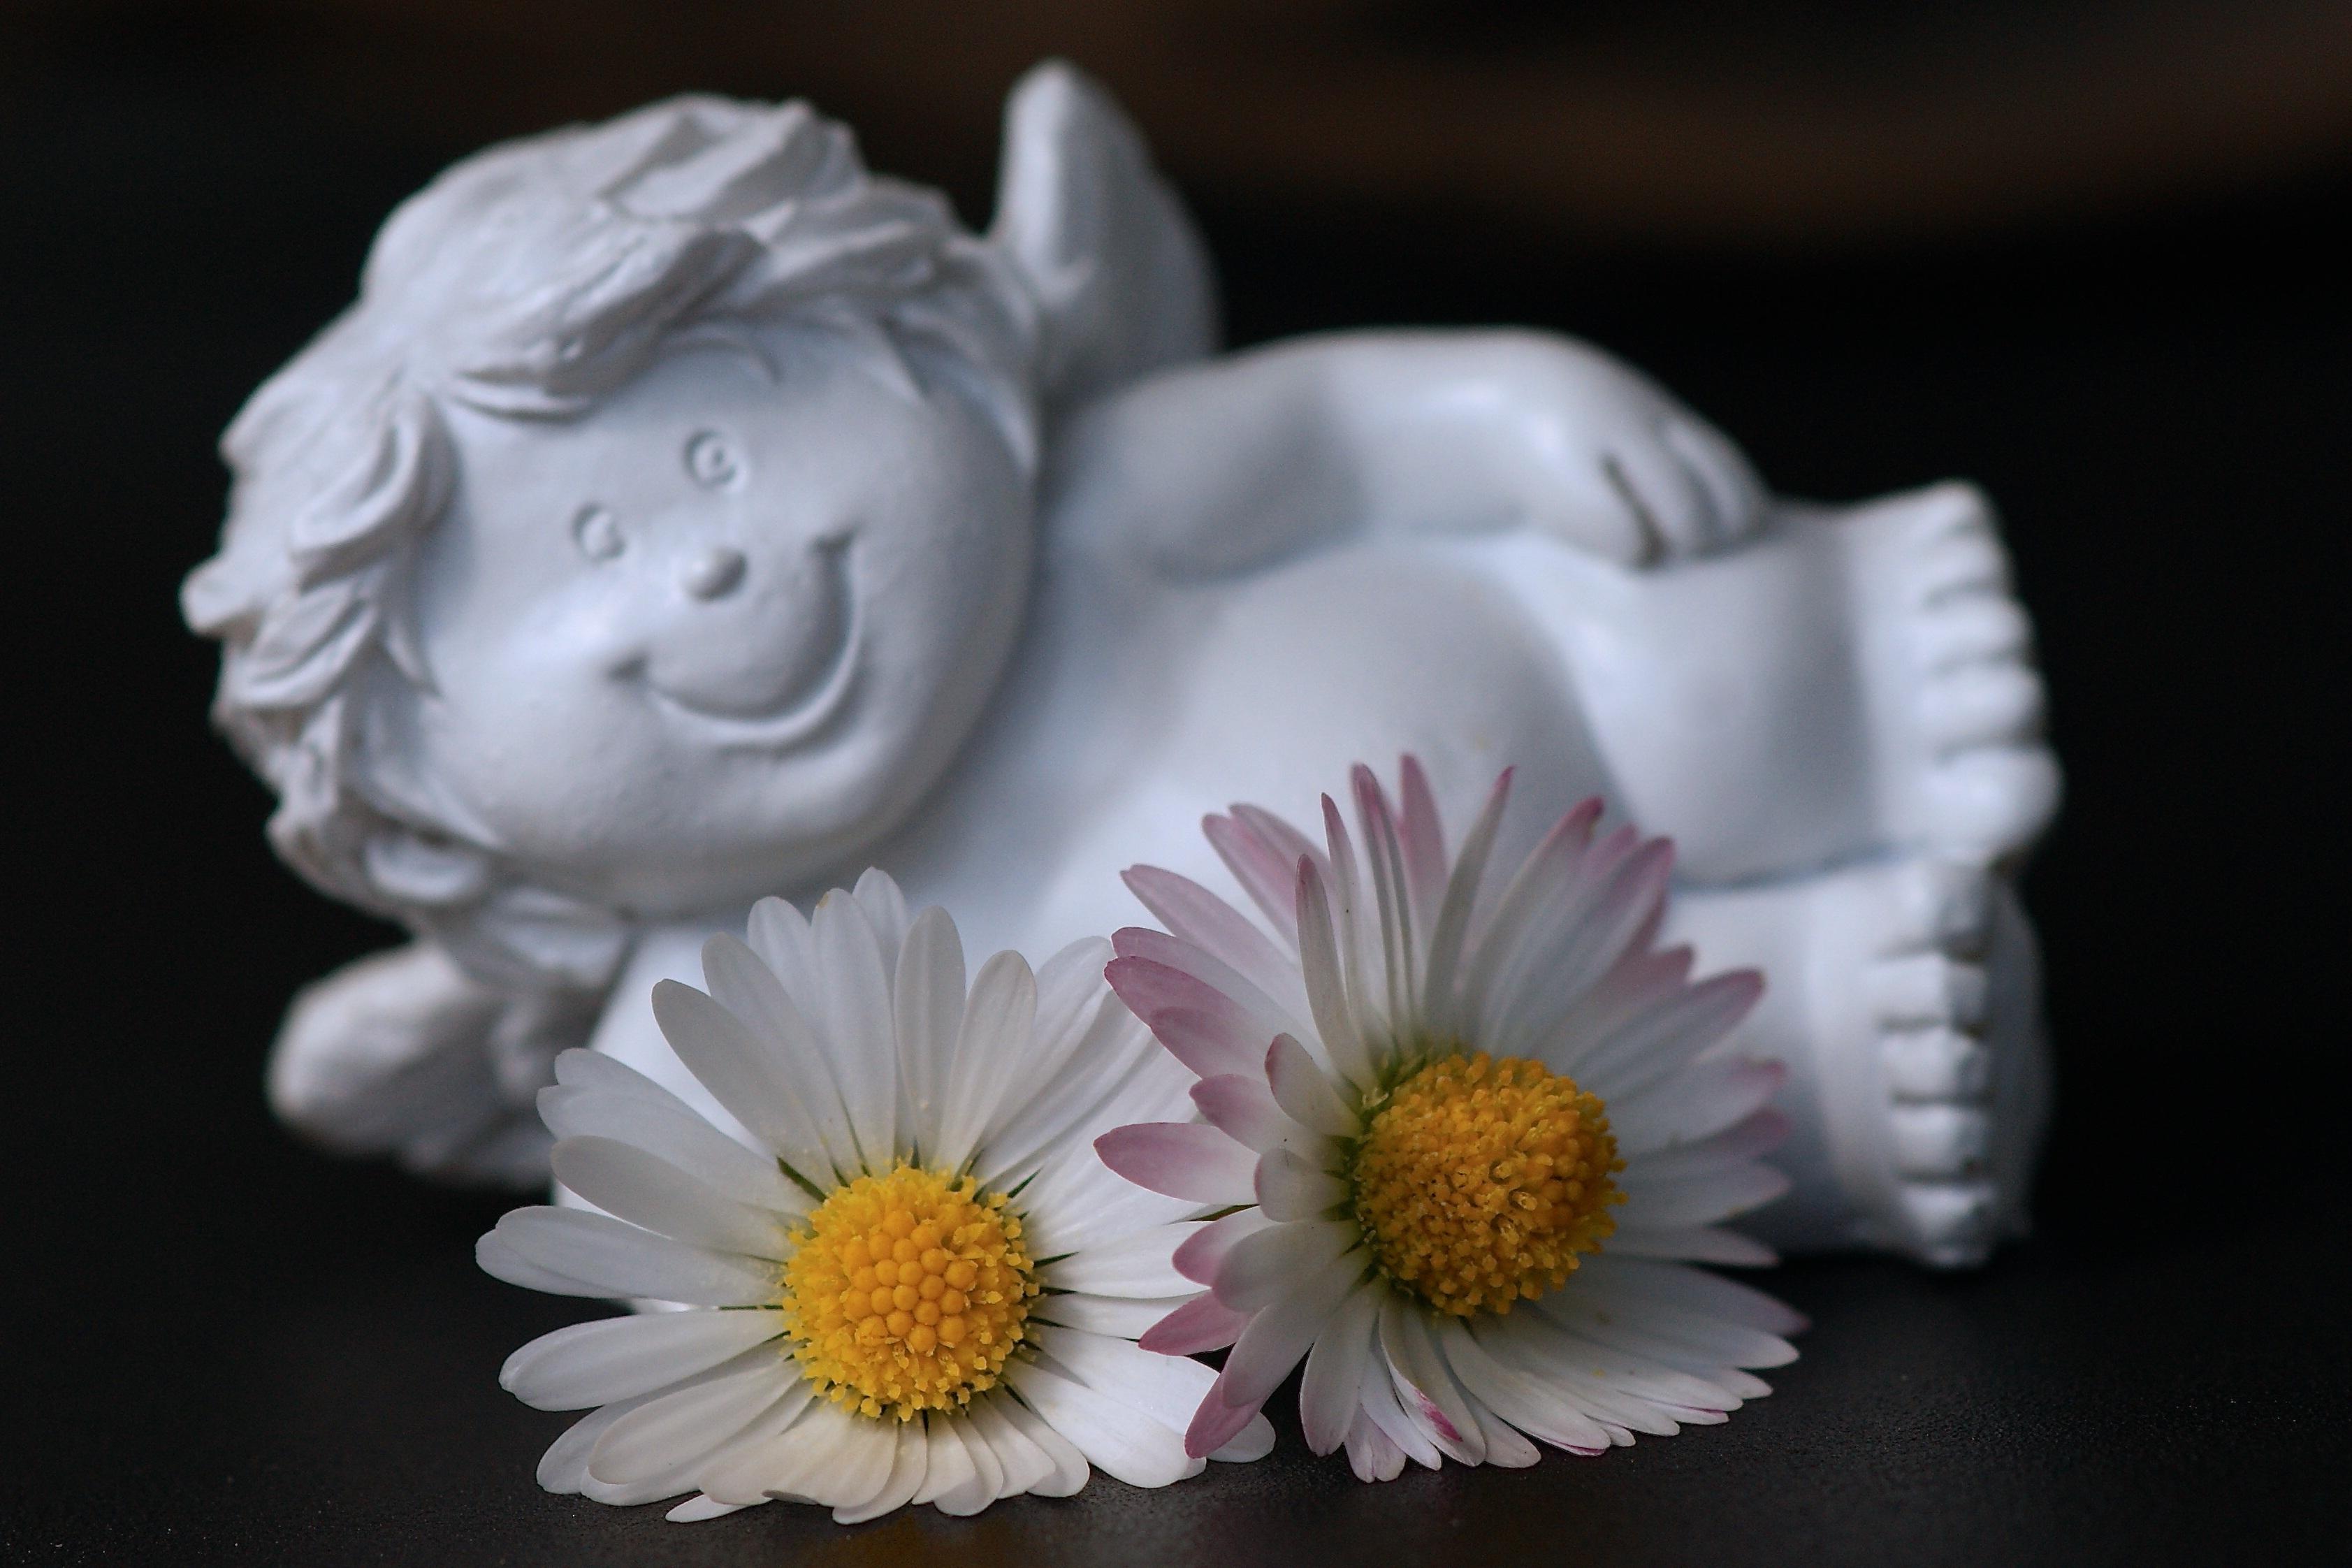 Free images blossom white petal bloom daisy serene laugh free images blossom white petal bloom daisy serene laugh close up cheerful face art fun happy bright figurine funny joy carving mood izmirmasajfo